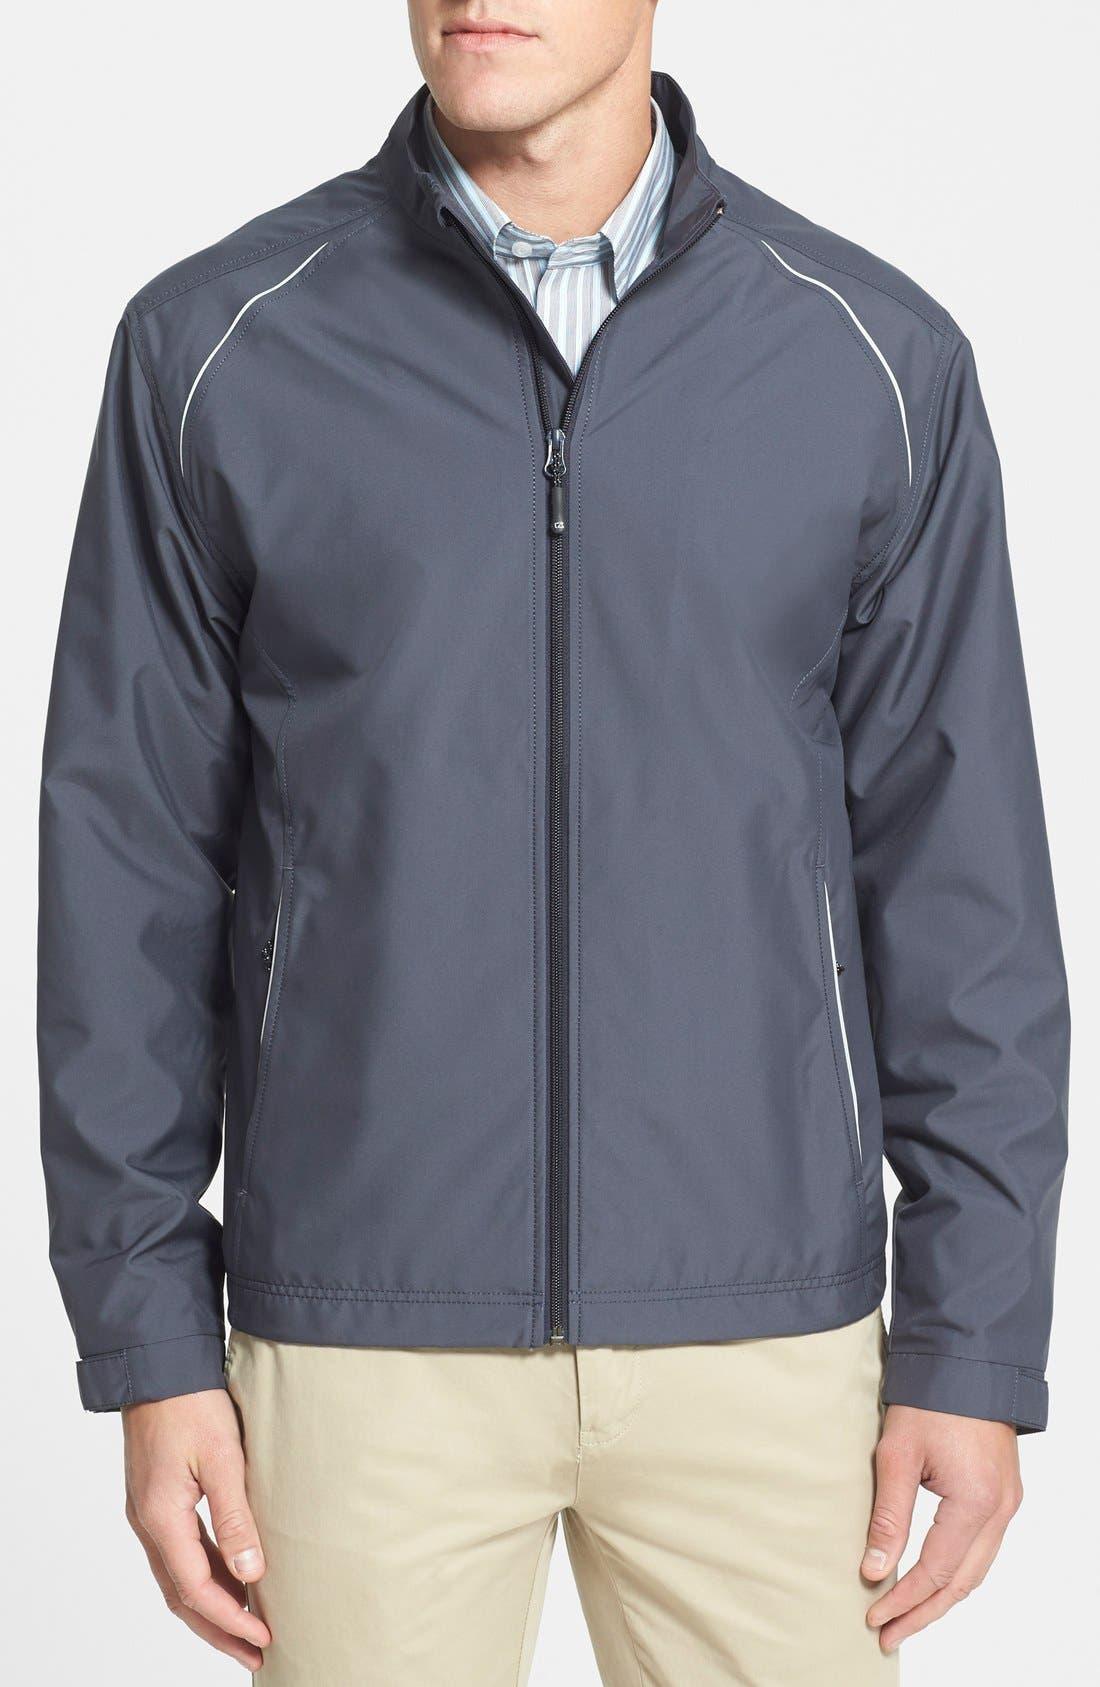 Beacon WeatherTec Wind & Water Resistant Jacket,                         Main,                         color, Onyx Grey